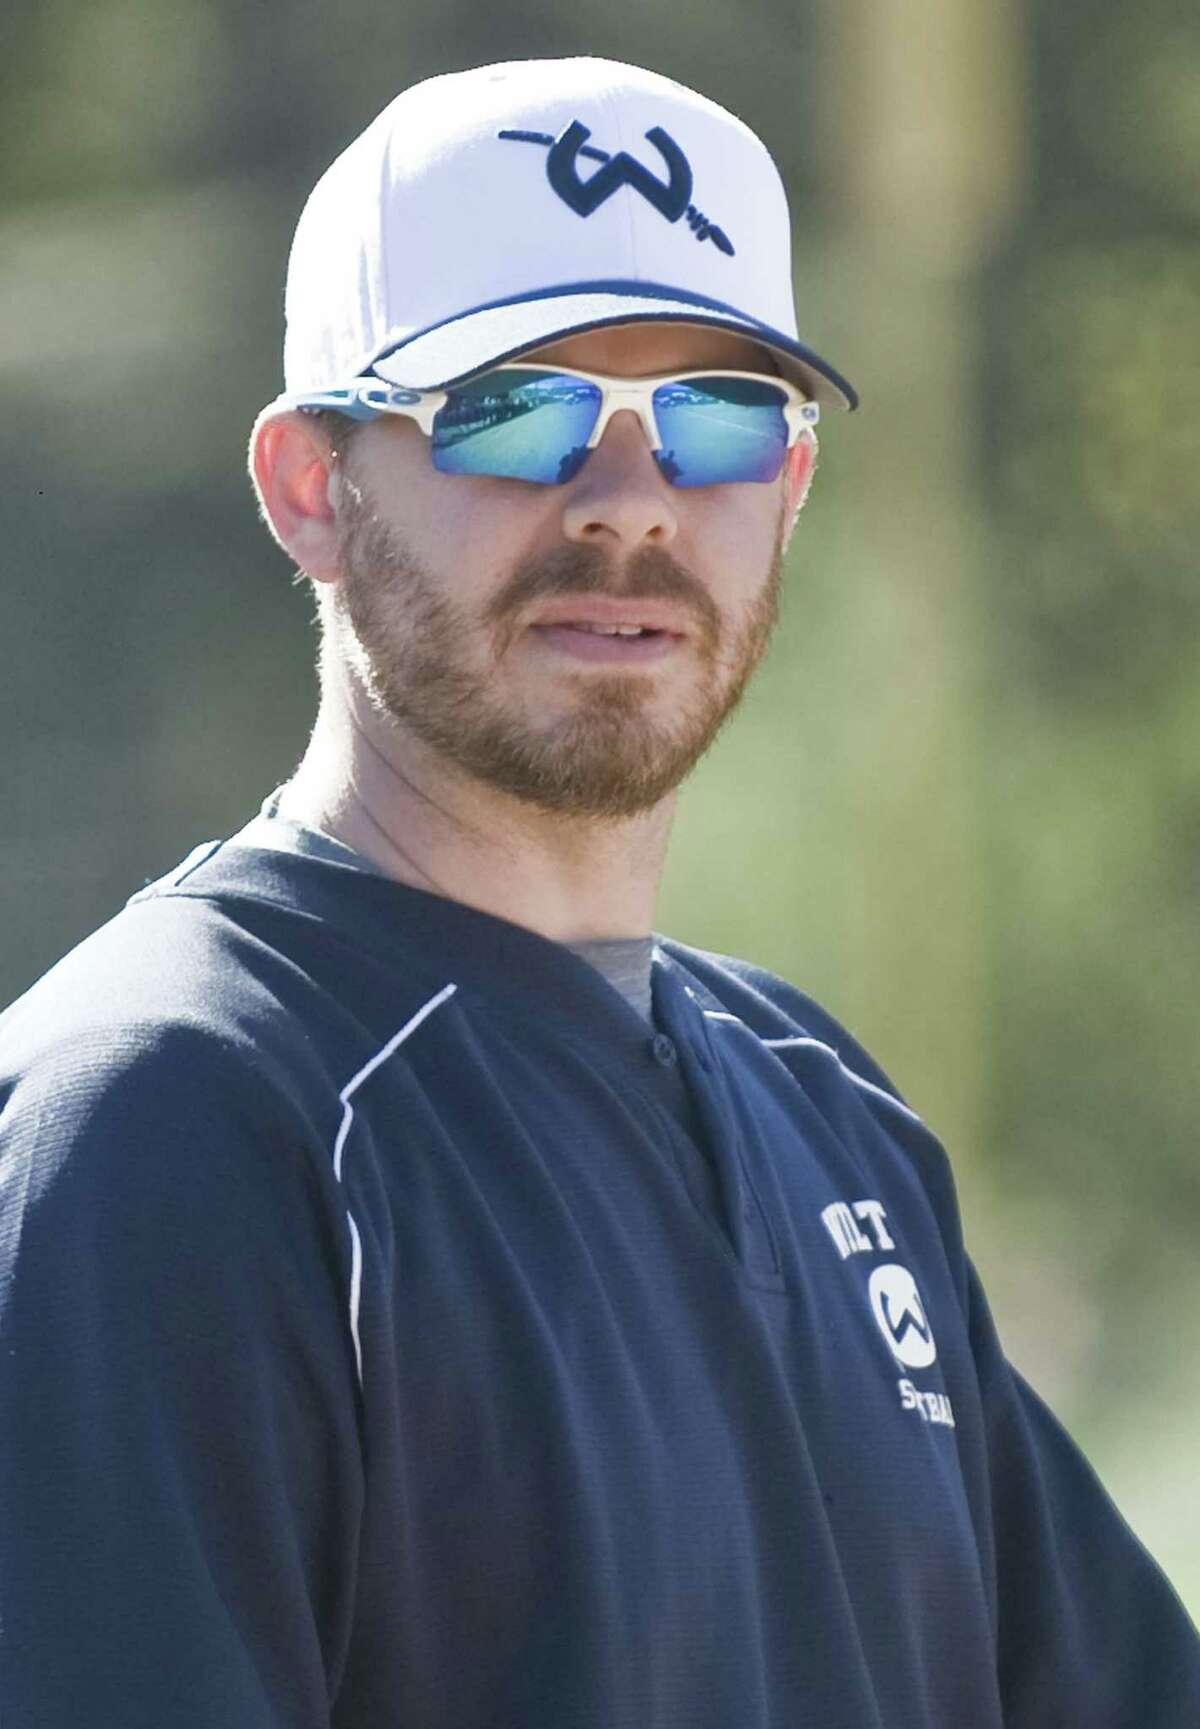 Wilton High School softball Head Coach Brian Jacobs. Wednesday, April 20, 2016